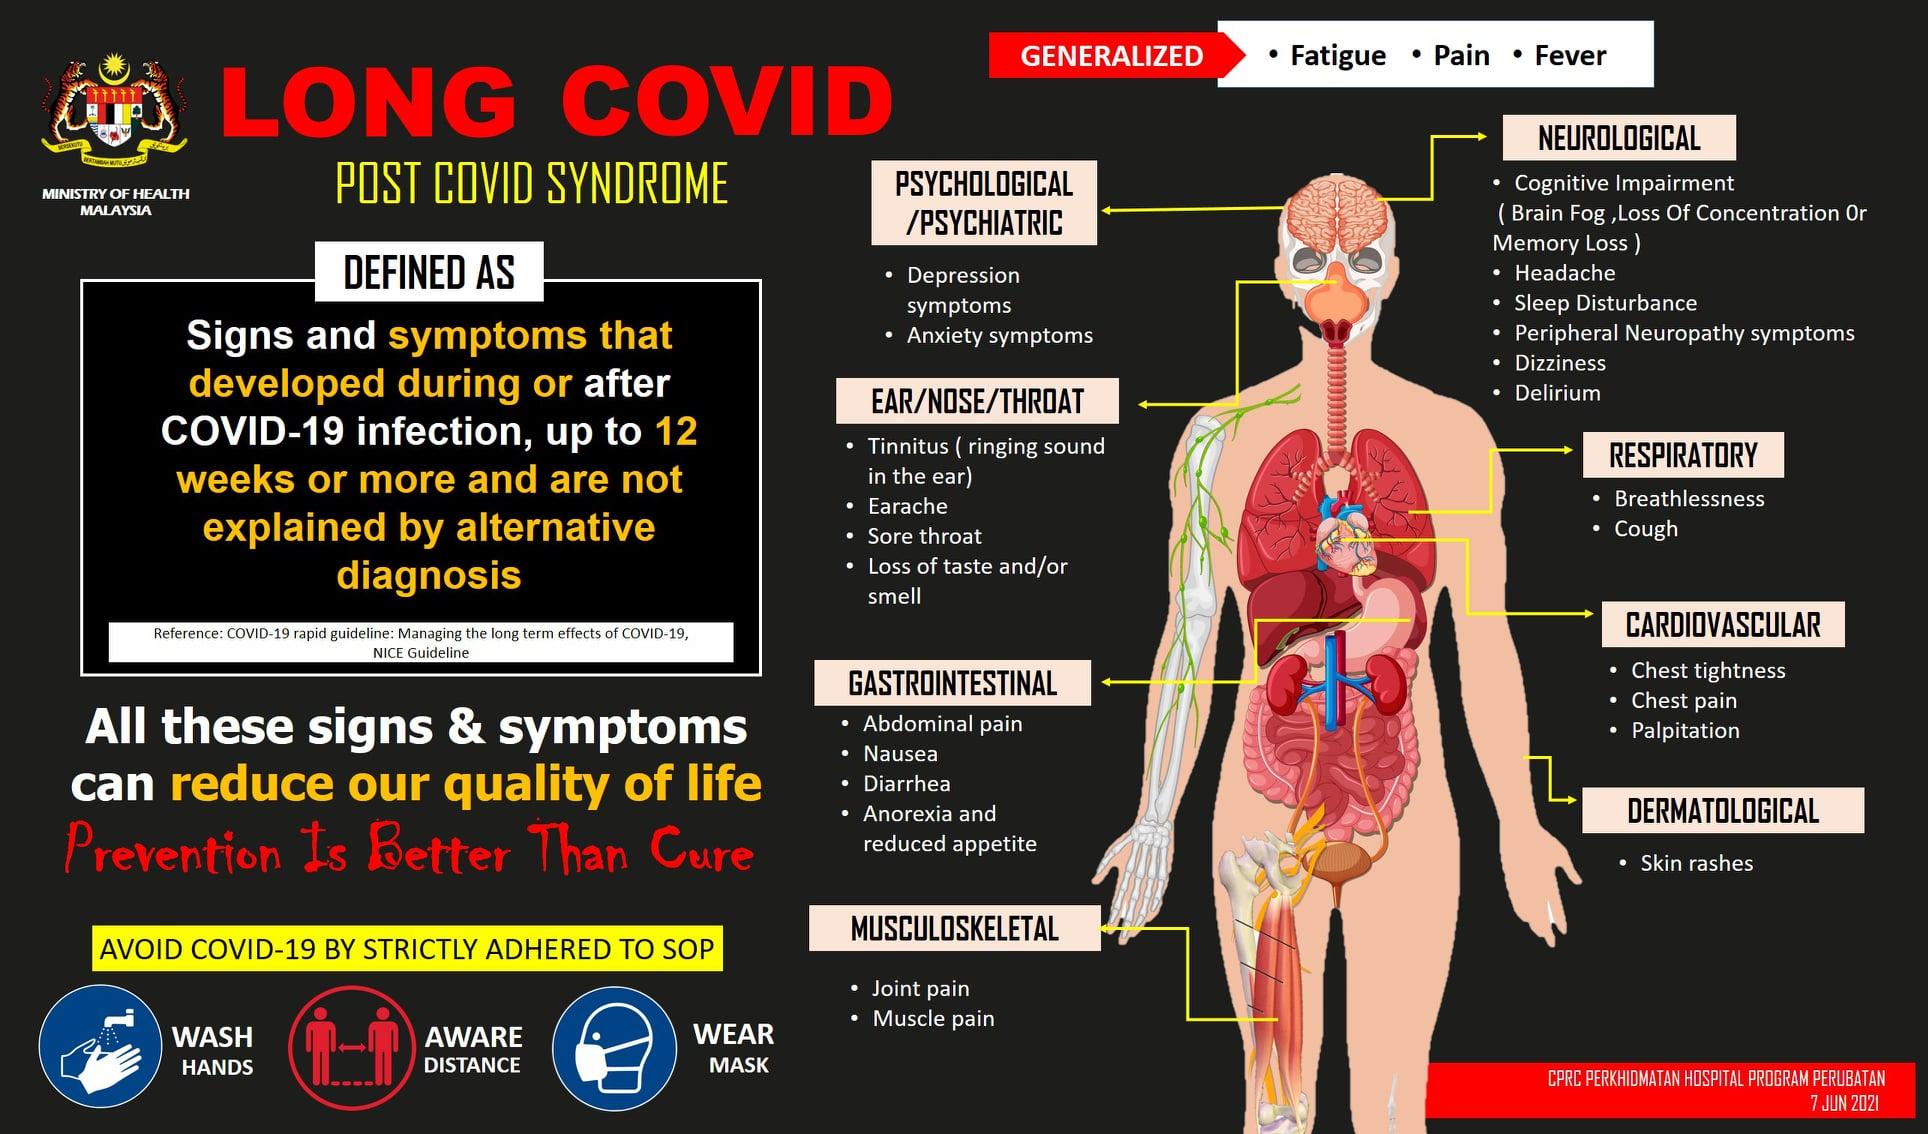 Sebulan Selepas Gejala Pertama COVID-19: Post COVID Syndrome